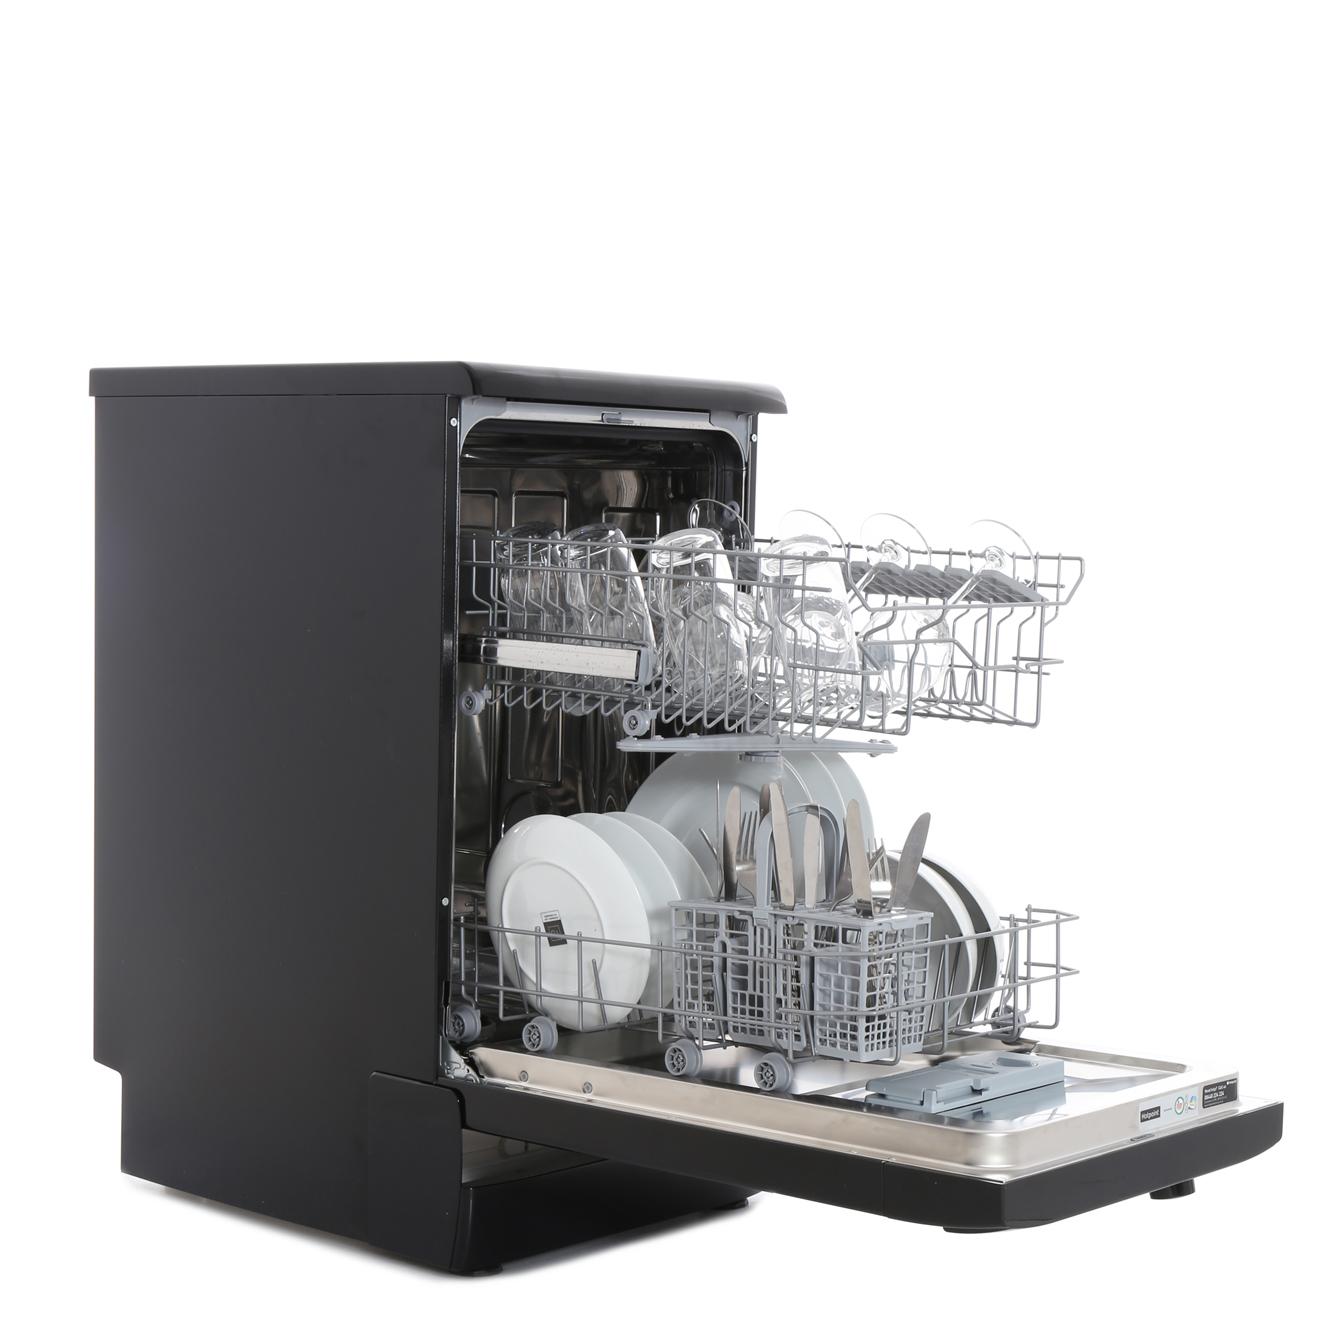 Small Dish Washer Hotpoint Sial11010k Slimline Dishwasher Black Buy Online Today